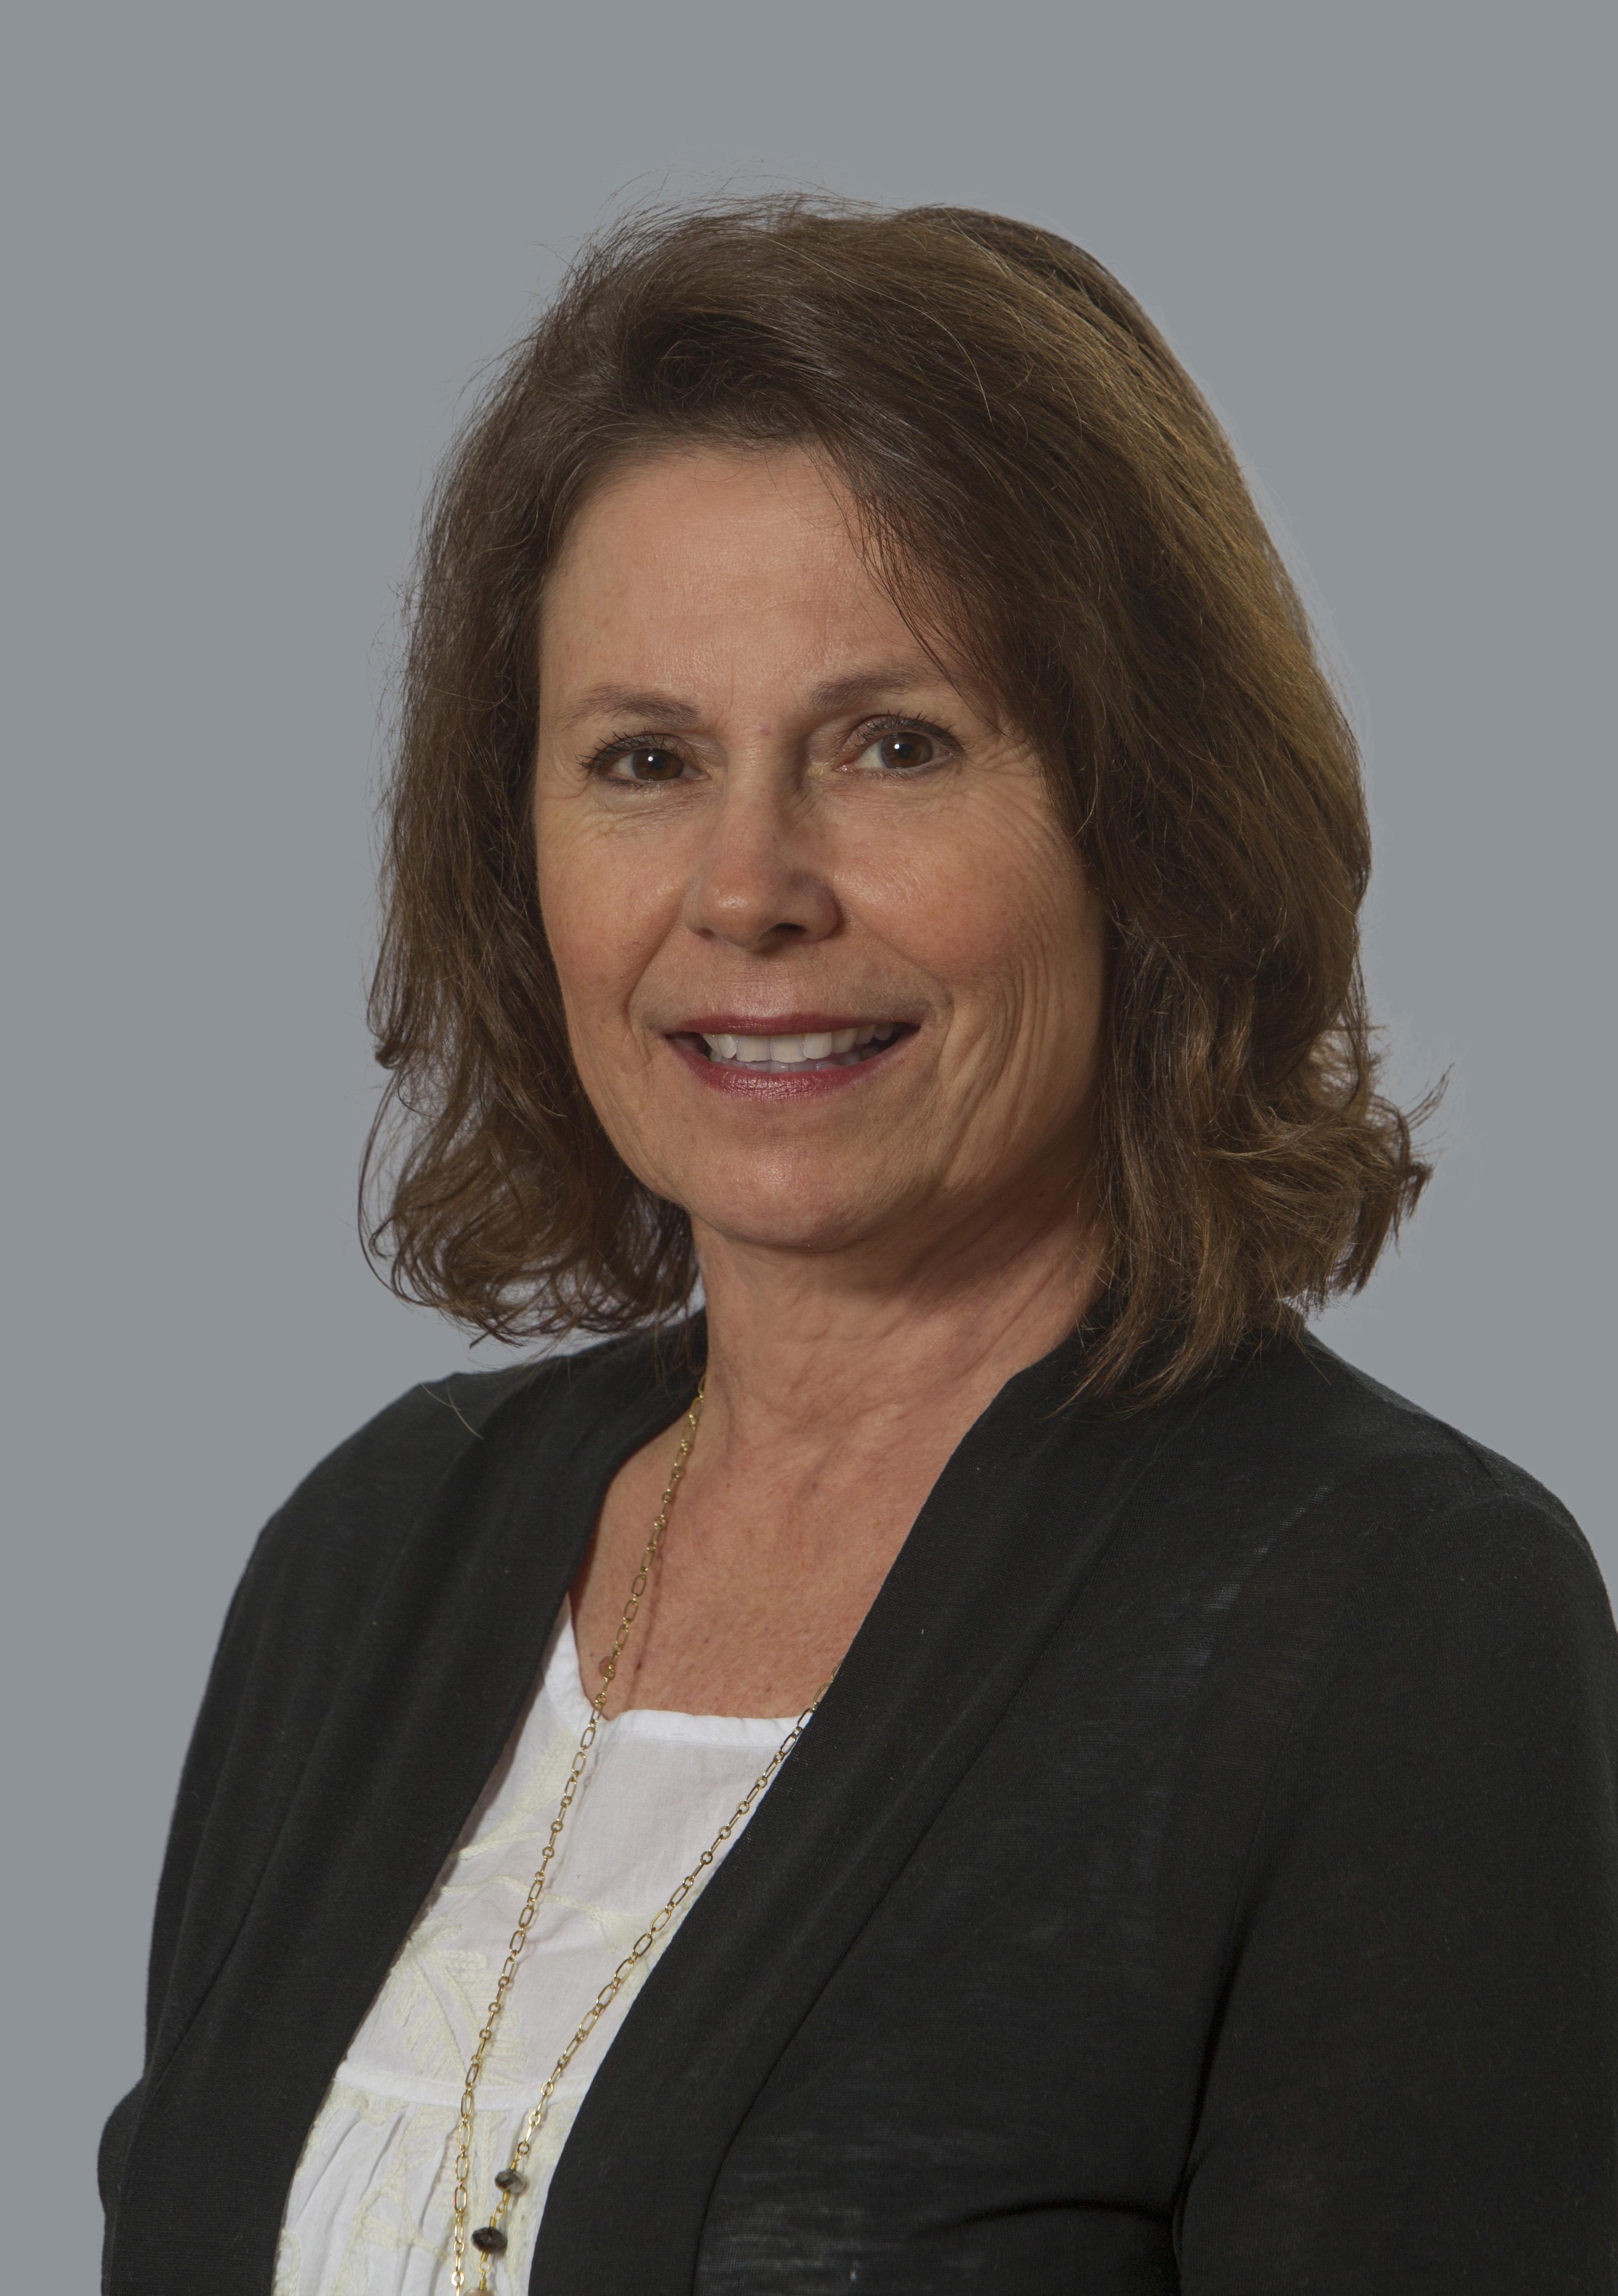 Margaret Boals